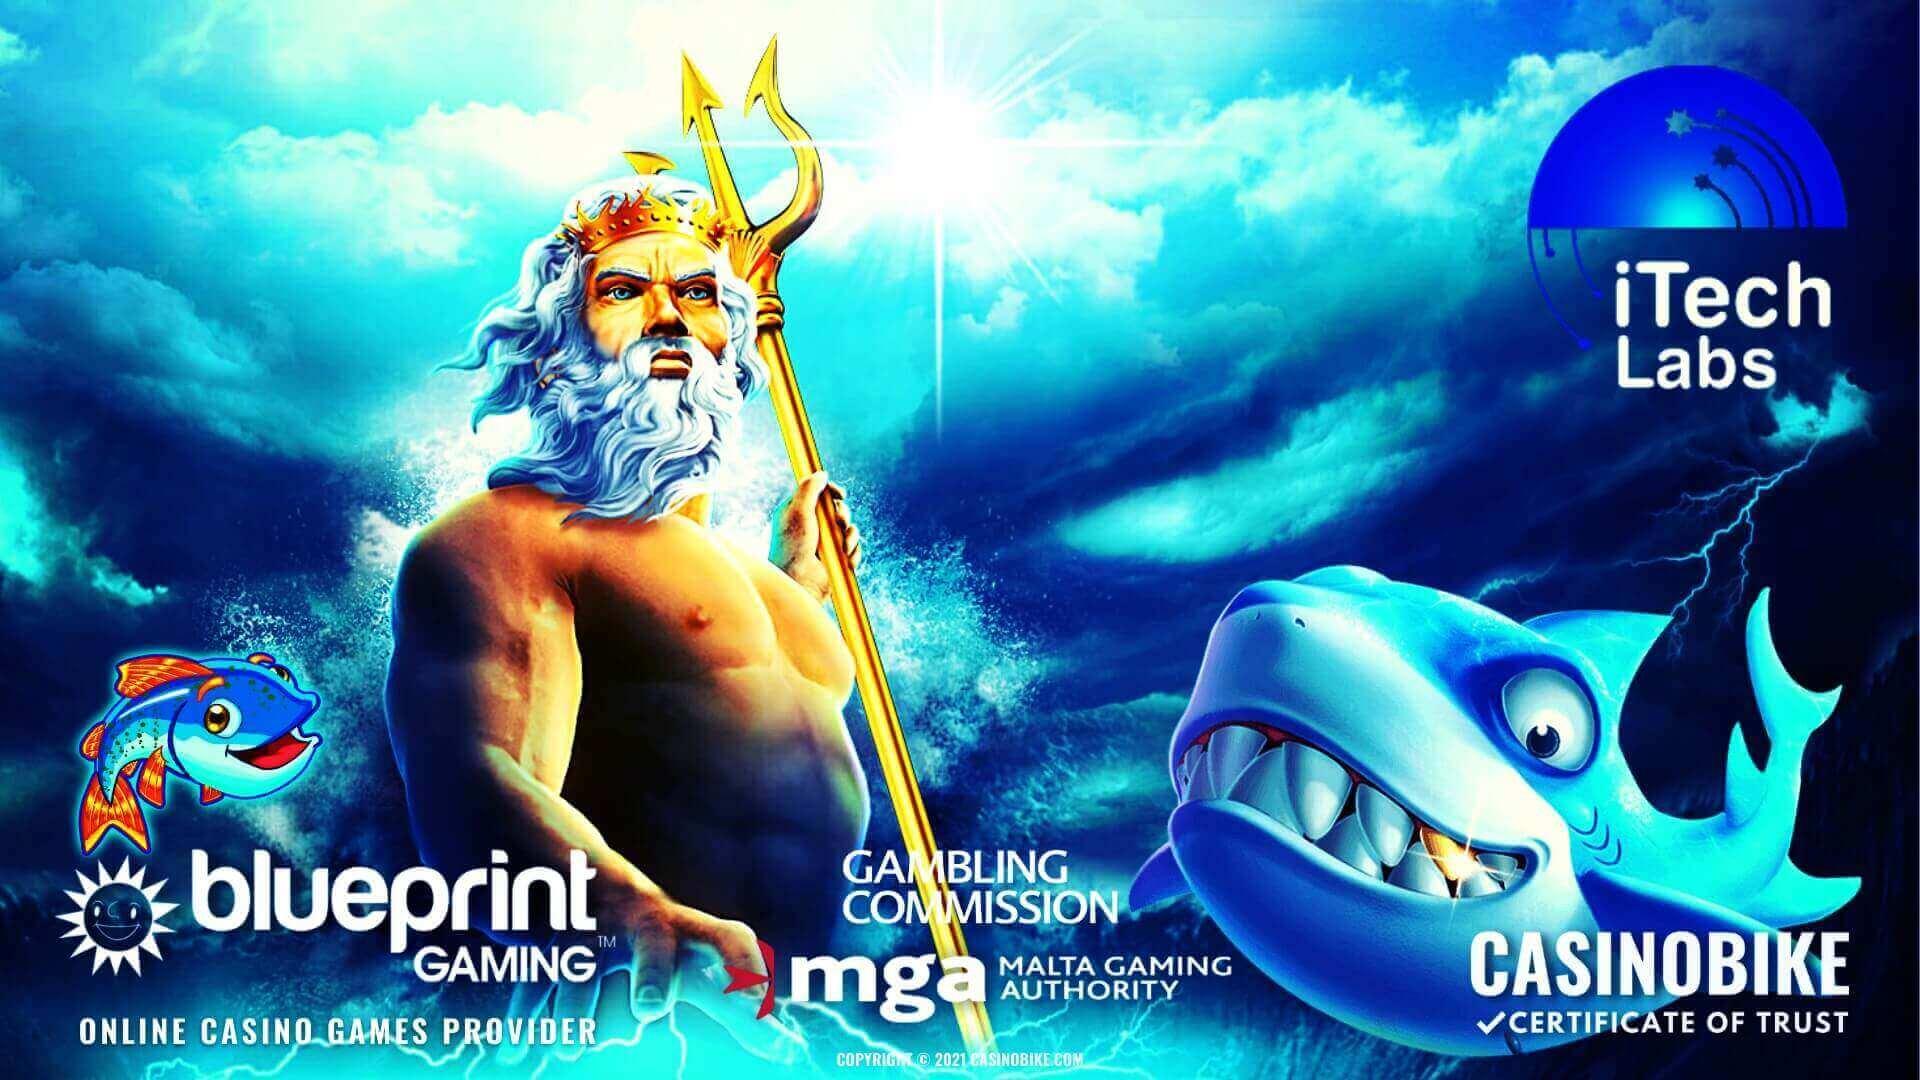 Blueprint Gaming Casino Slots Provider